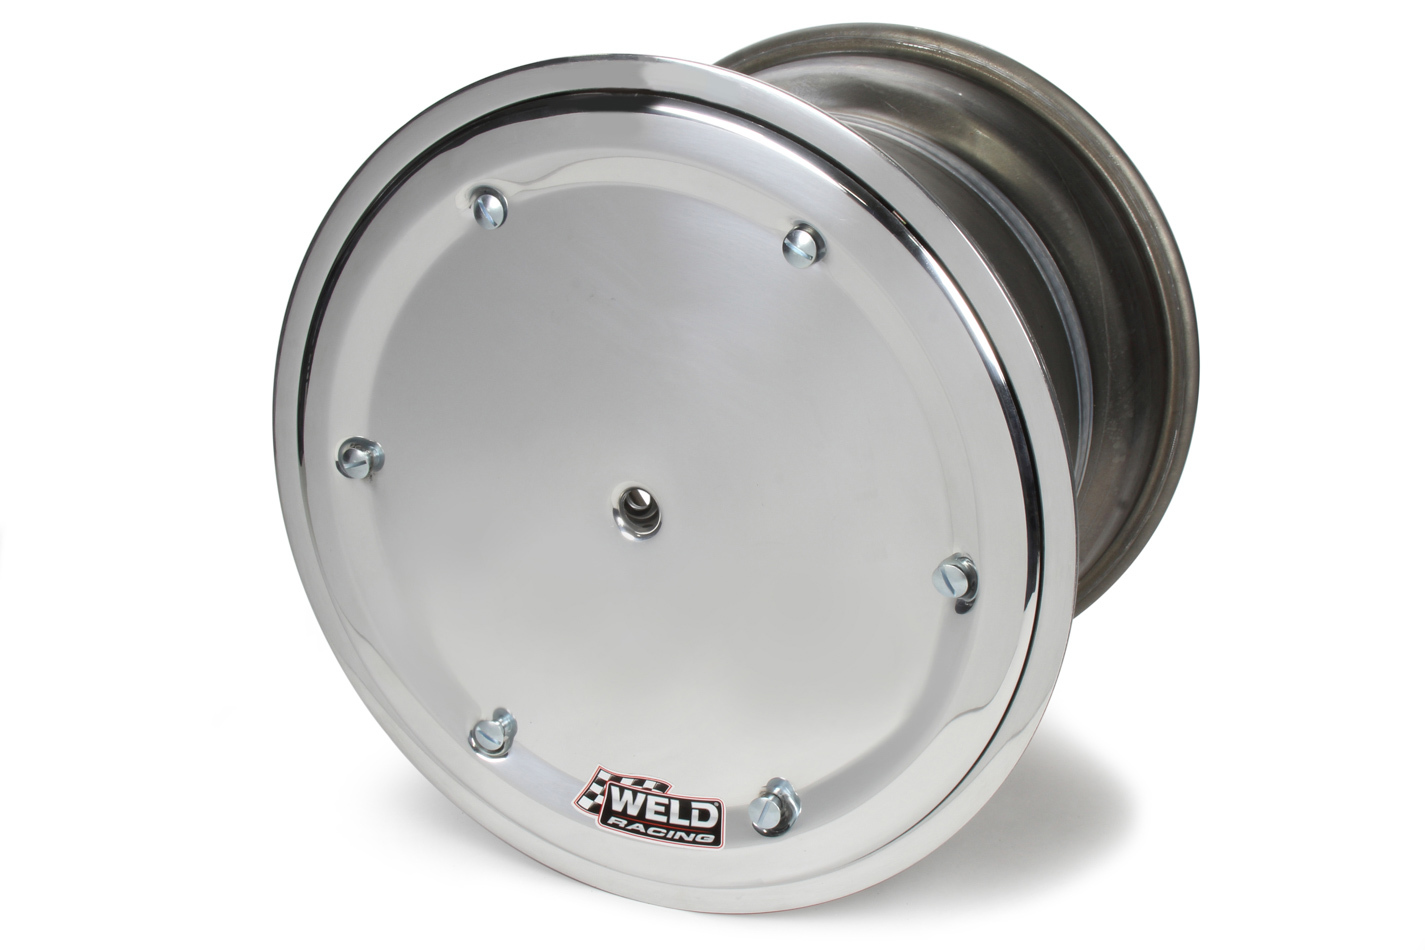 WELD RACING 15 X 12 Wide 5 XL 4in BS Bead-Loc  13.2 lbs w/Cvr P/N - 559-5254-6